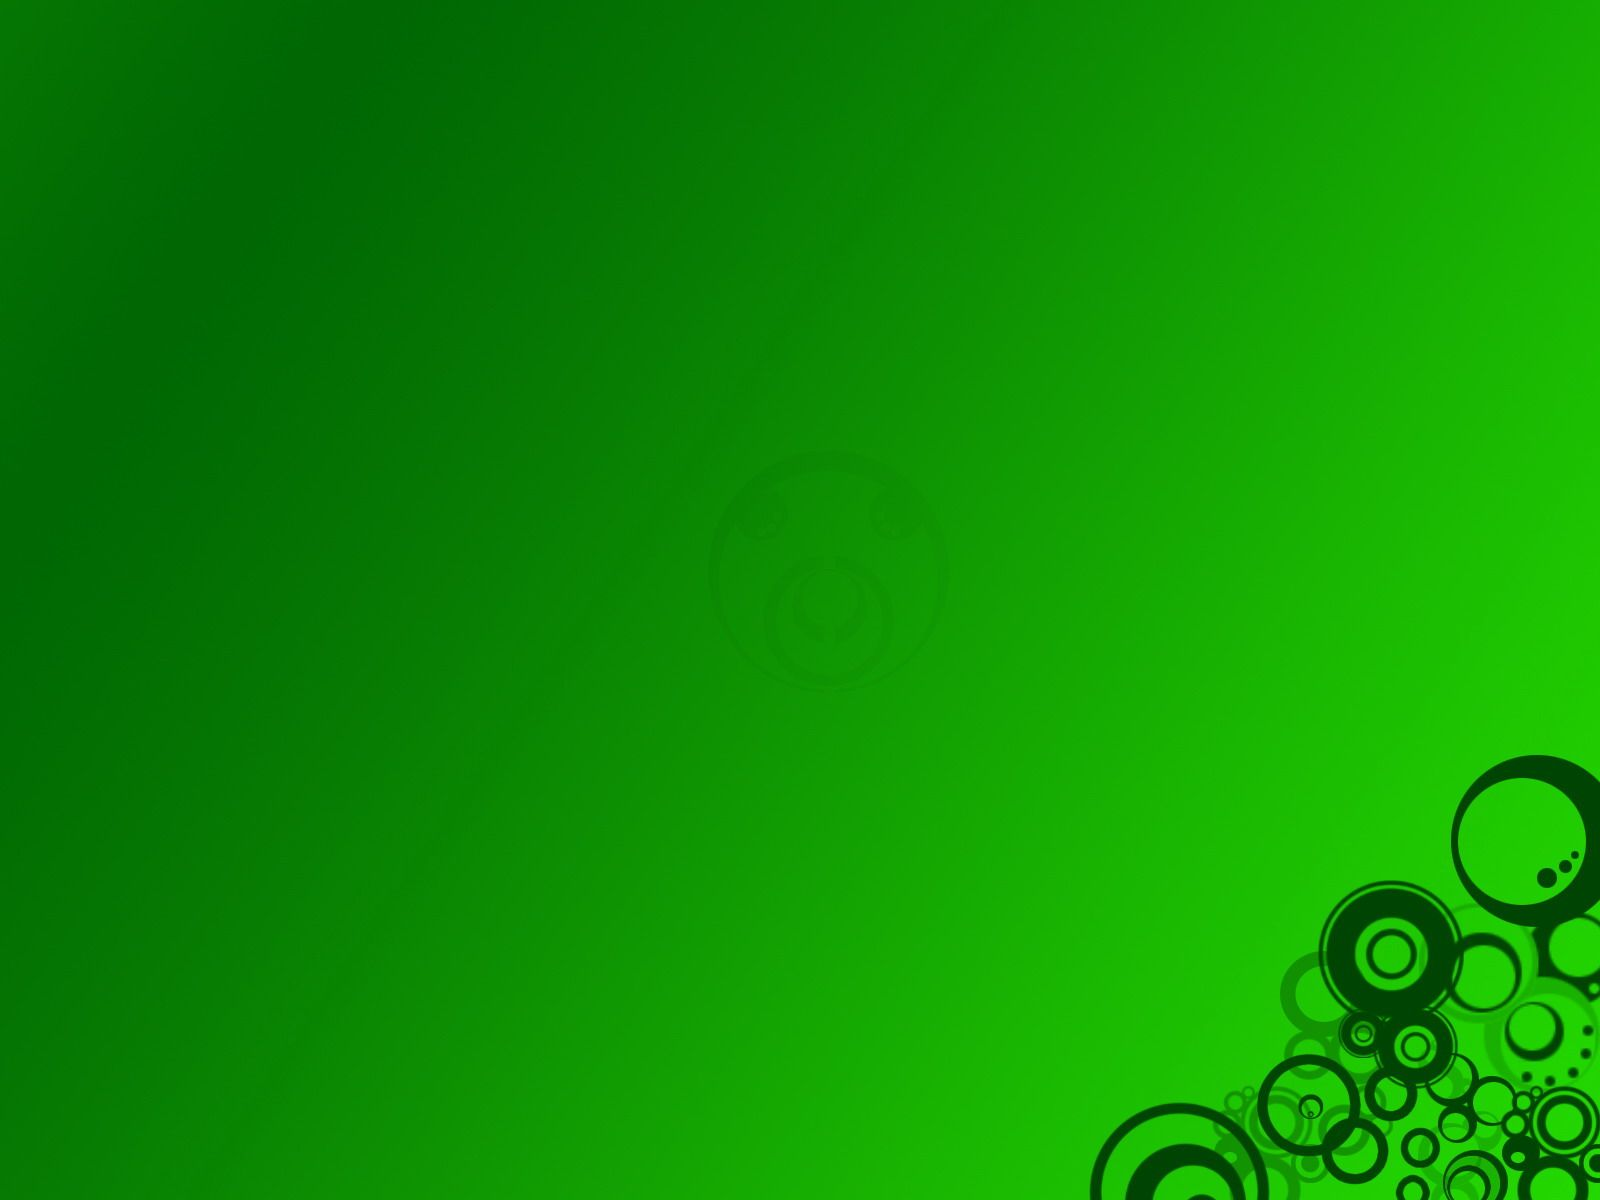 Jennifer Crawford Crawford4982 Green Wallpaper Hd Wallpaper Desktop Abstract Wallpaper